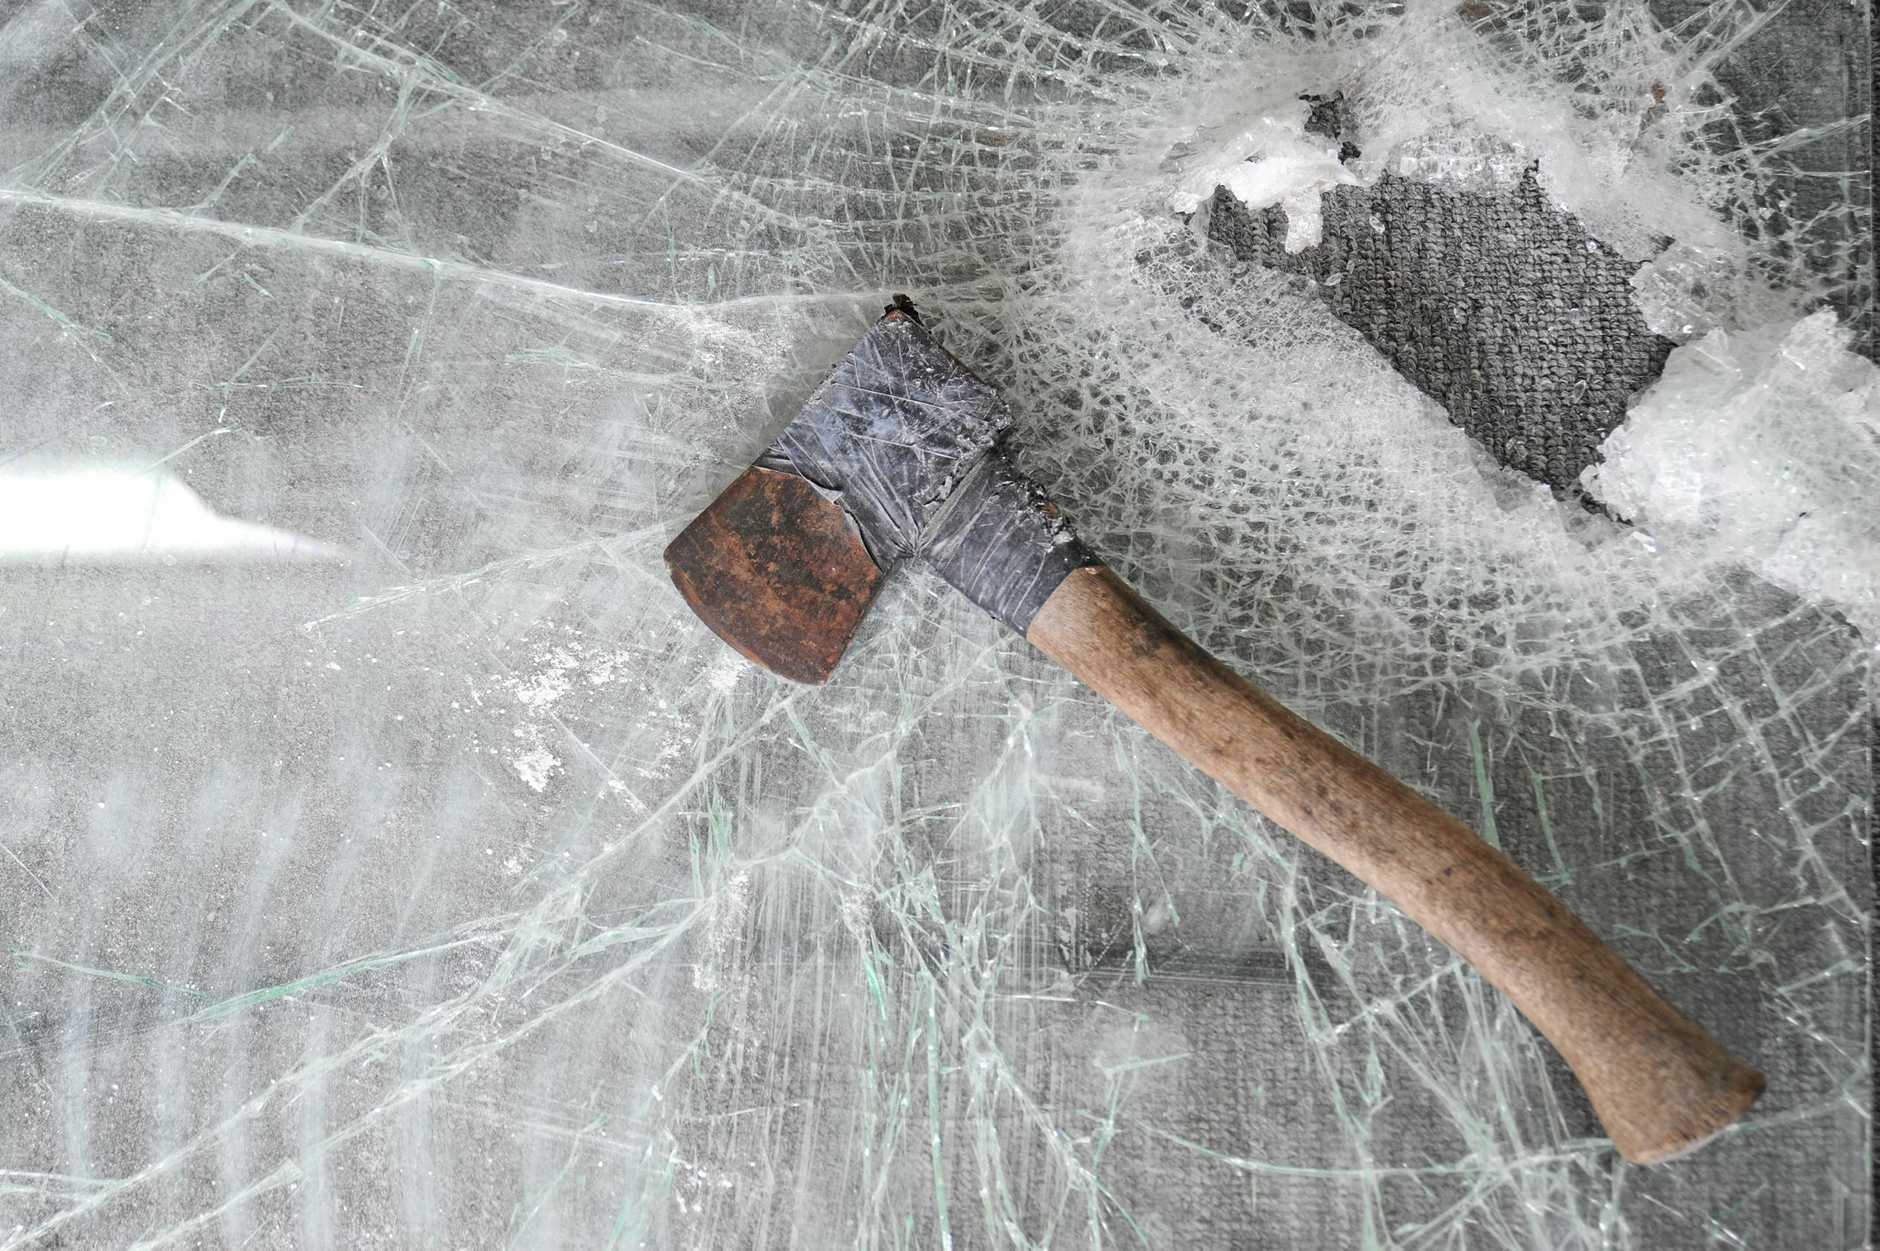 A tomahawk was used to rob a Sunshine Coast cafe overnight.